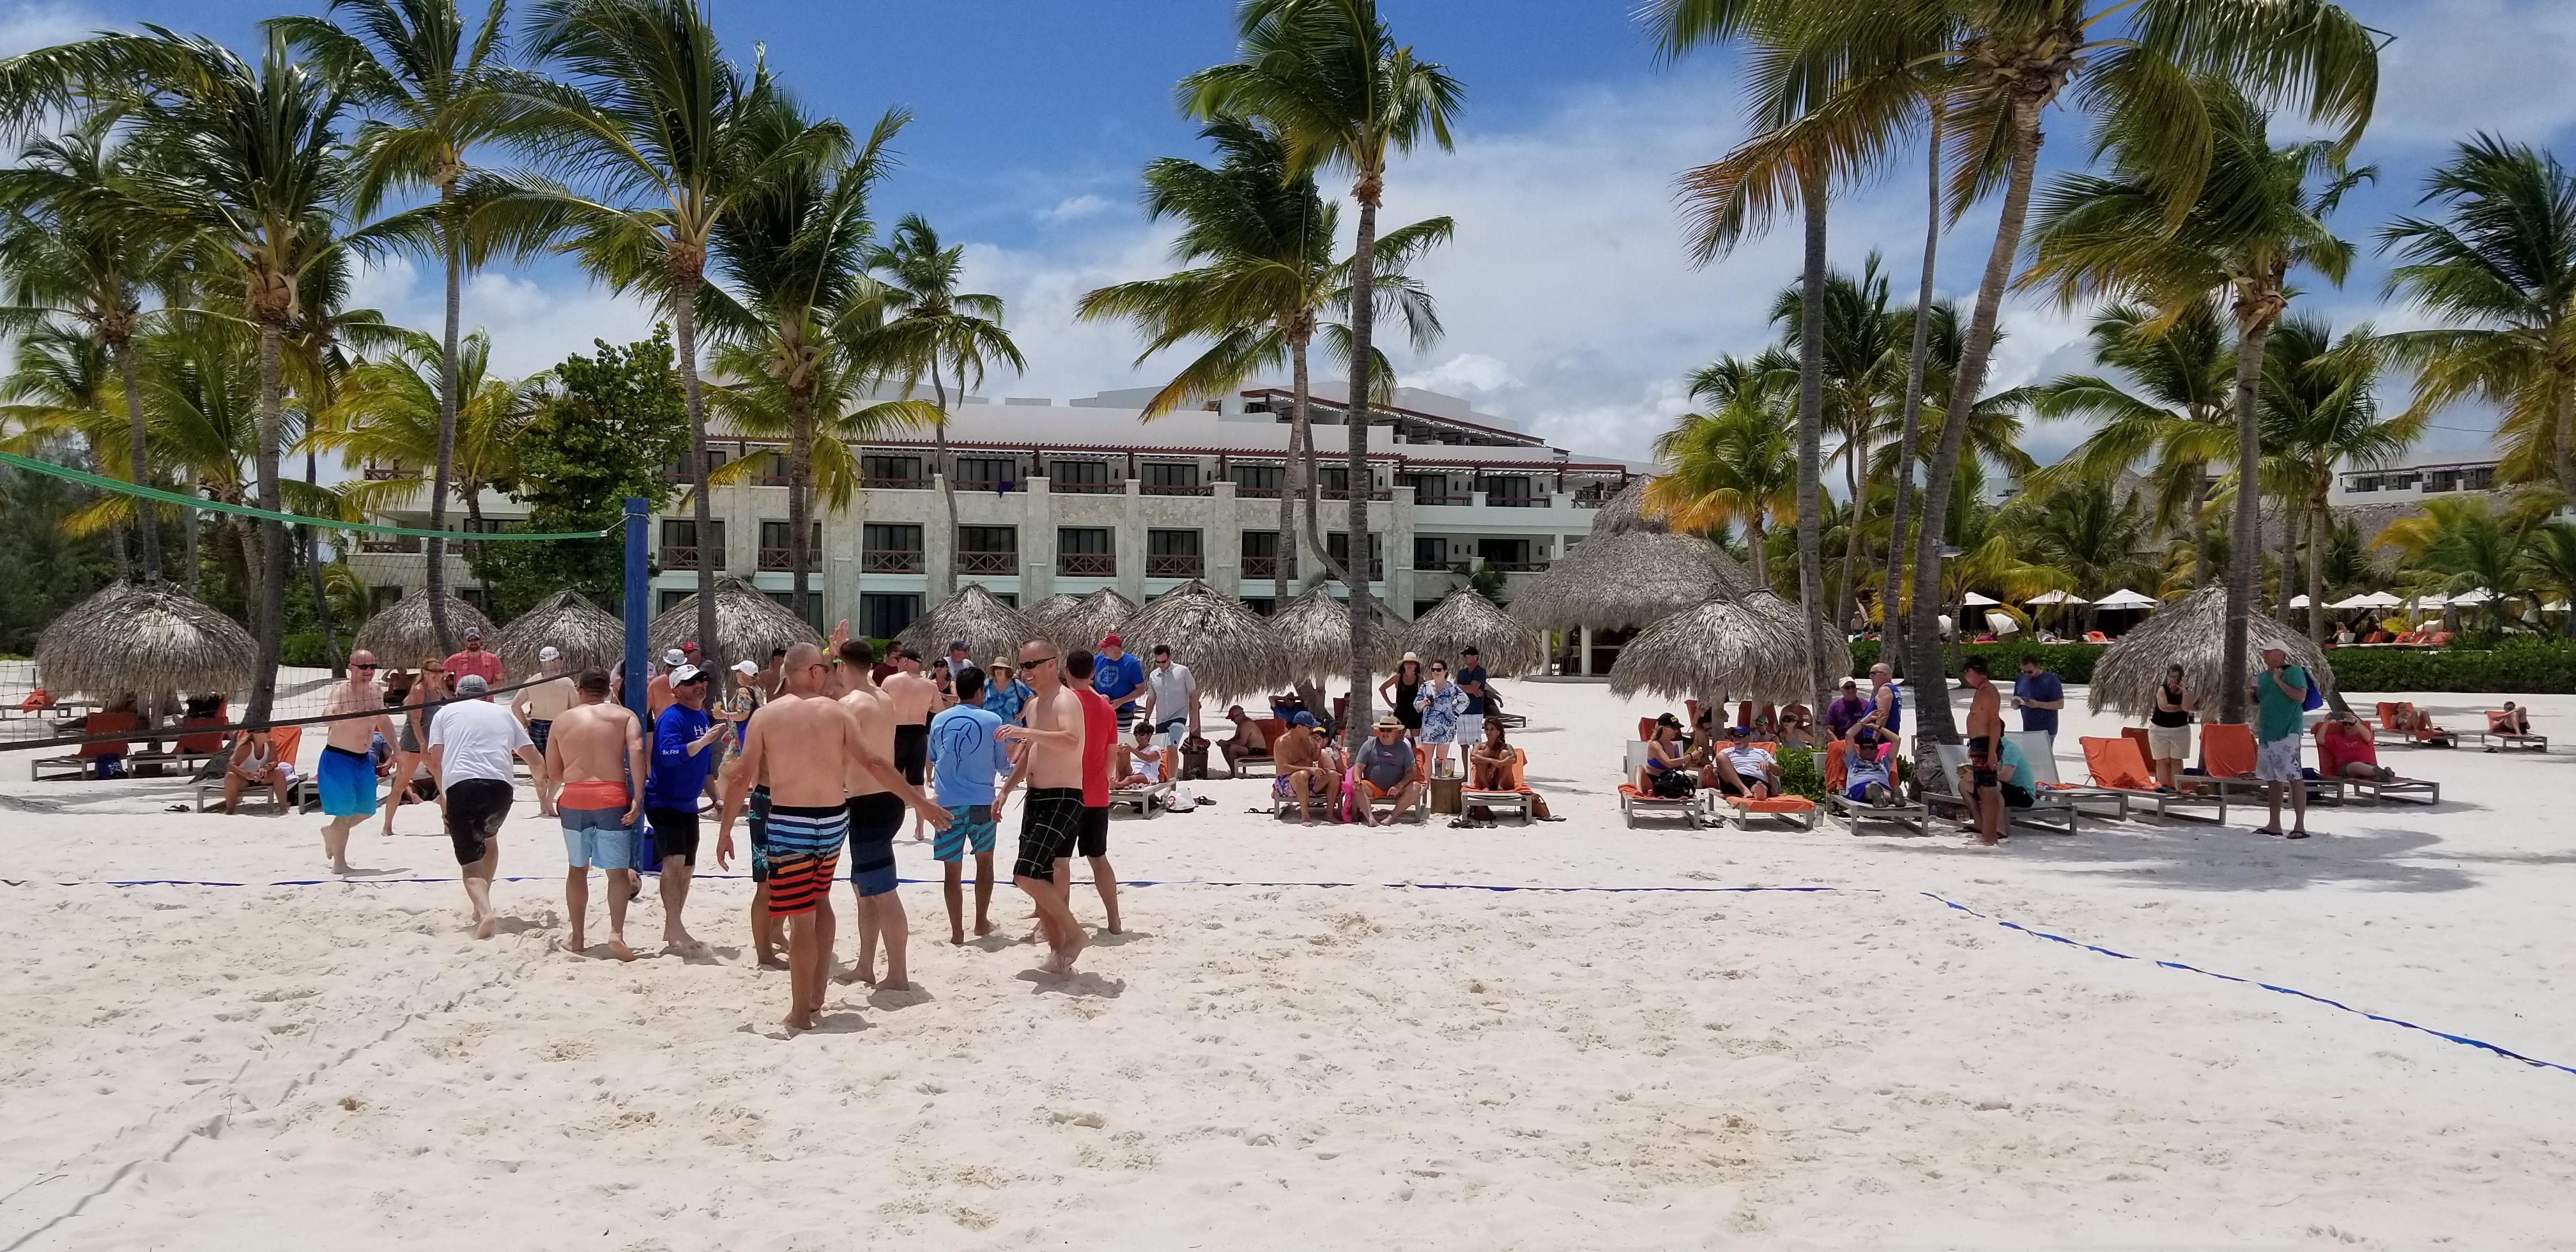 Photos: ITDG Celebrates 25th Anniversary in Punta Cana